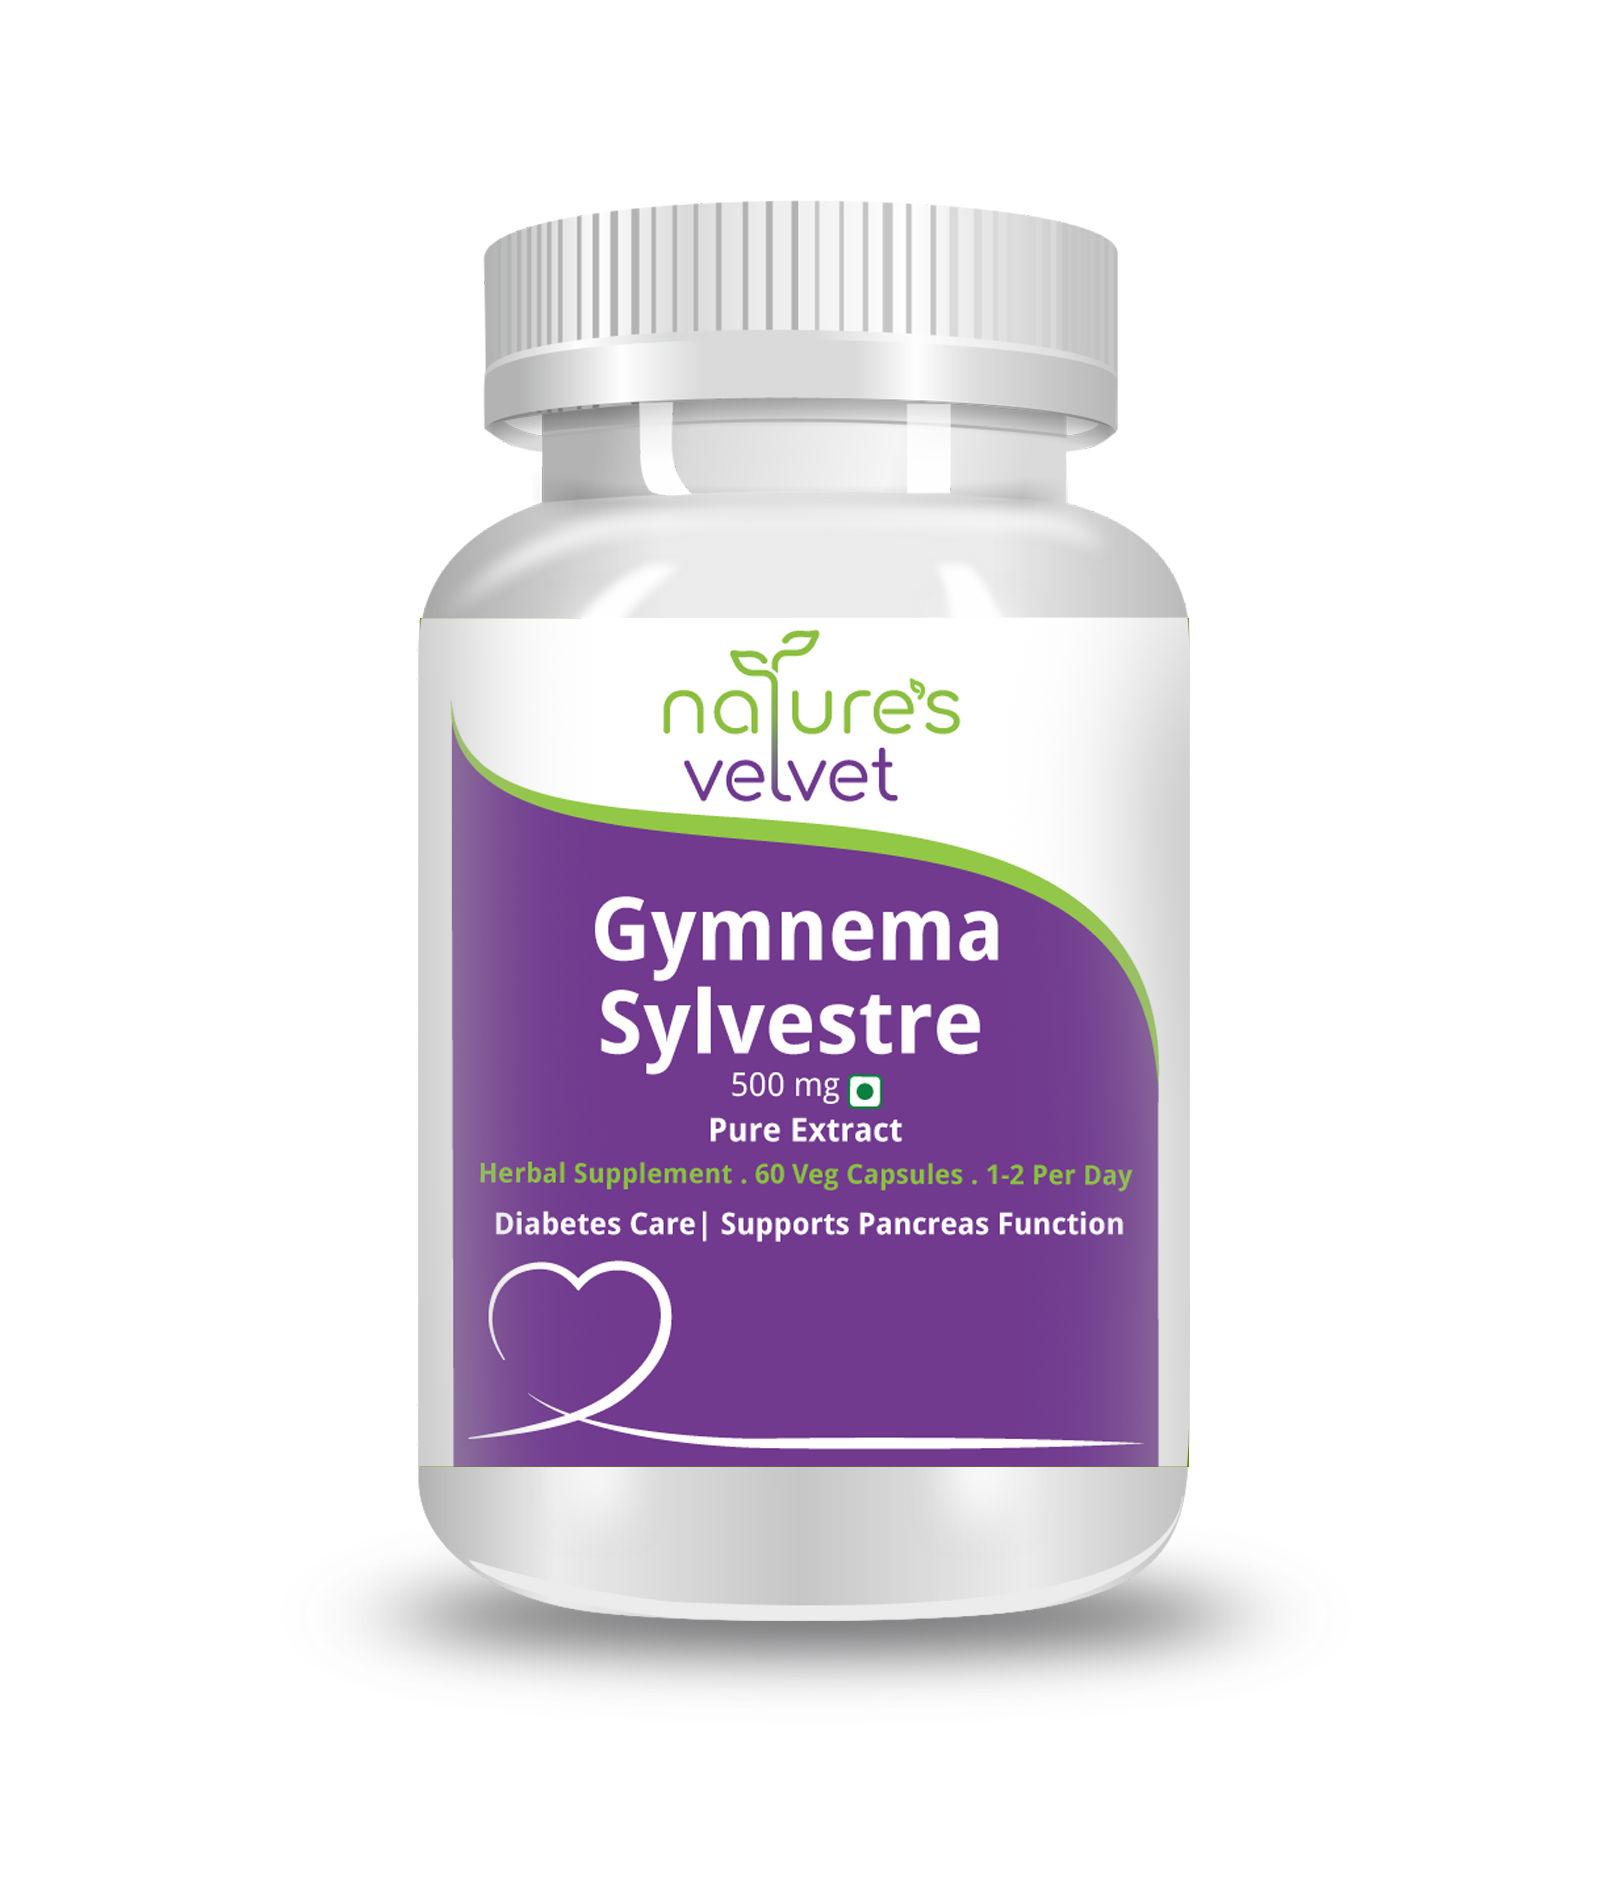 Nature's Velvet Gymnema Sylvestre Pure Extract 500mg 60 Veg Capsules